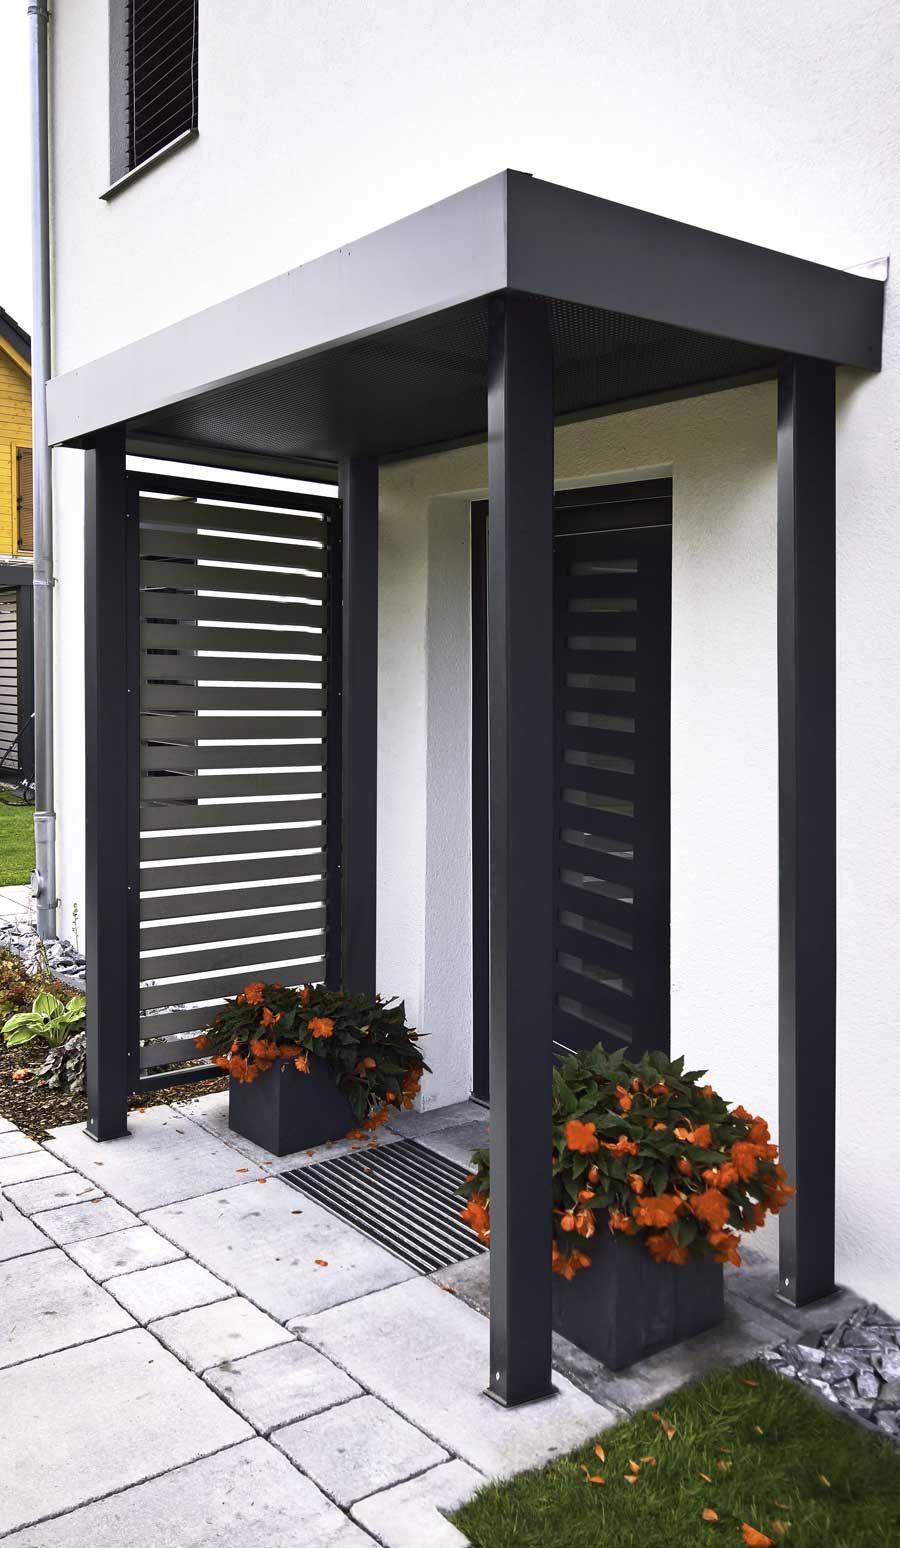 #Vordach #Eingangsüberdachung #Haustürvordach #Haustürüberdachung #Siebau